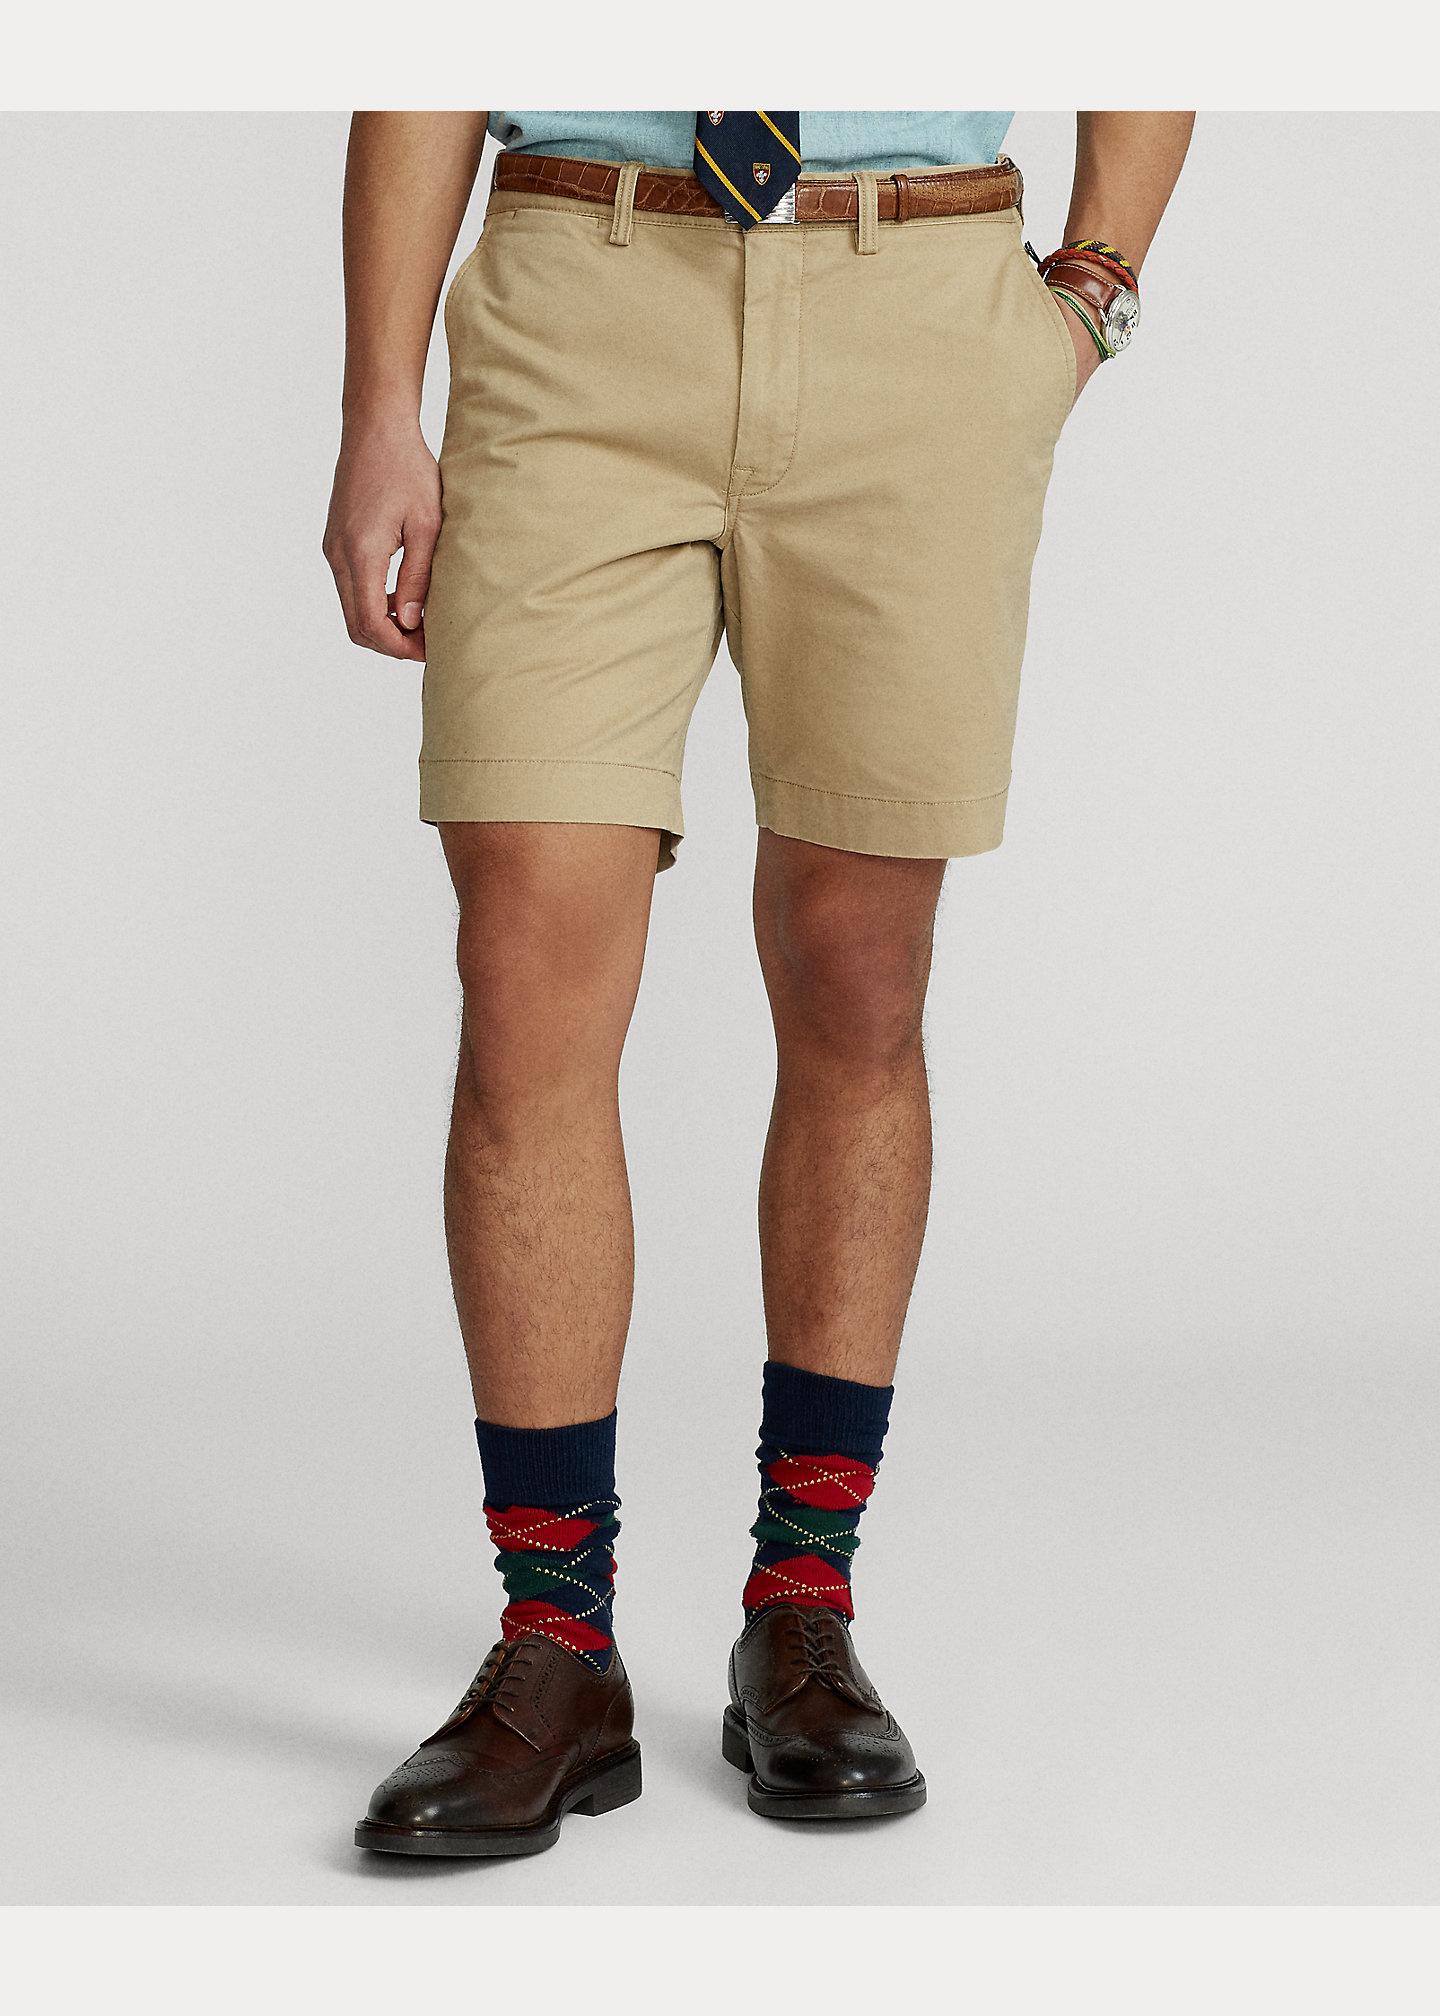 Ralph Lauren shorts Ralph Lauren 710-799213-009